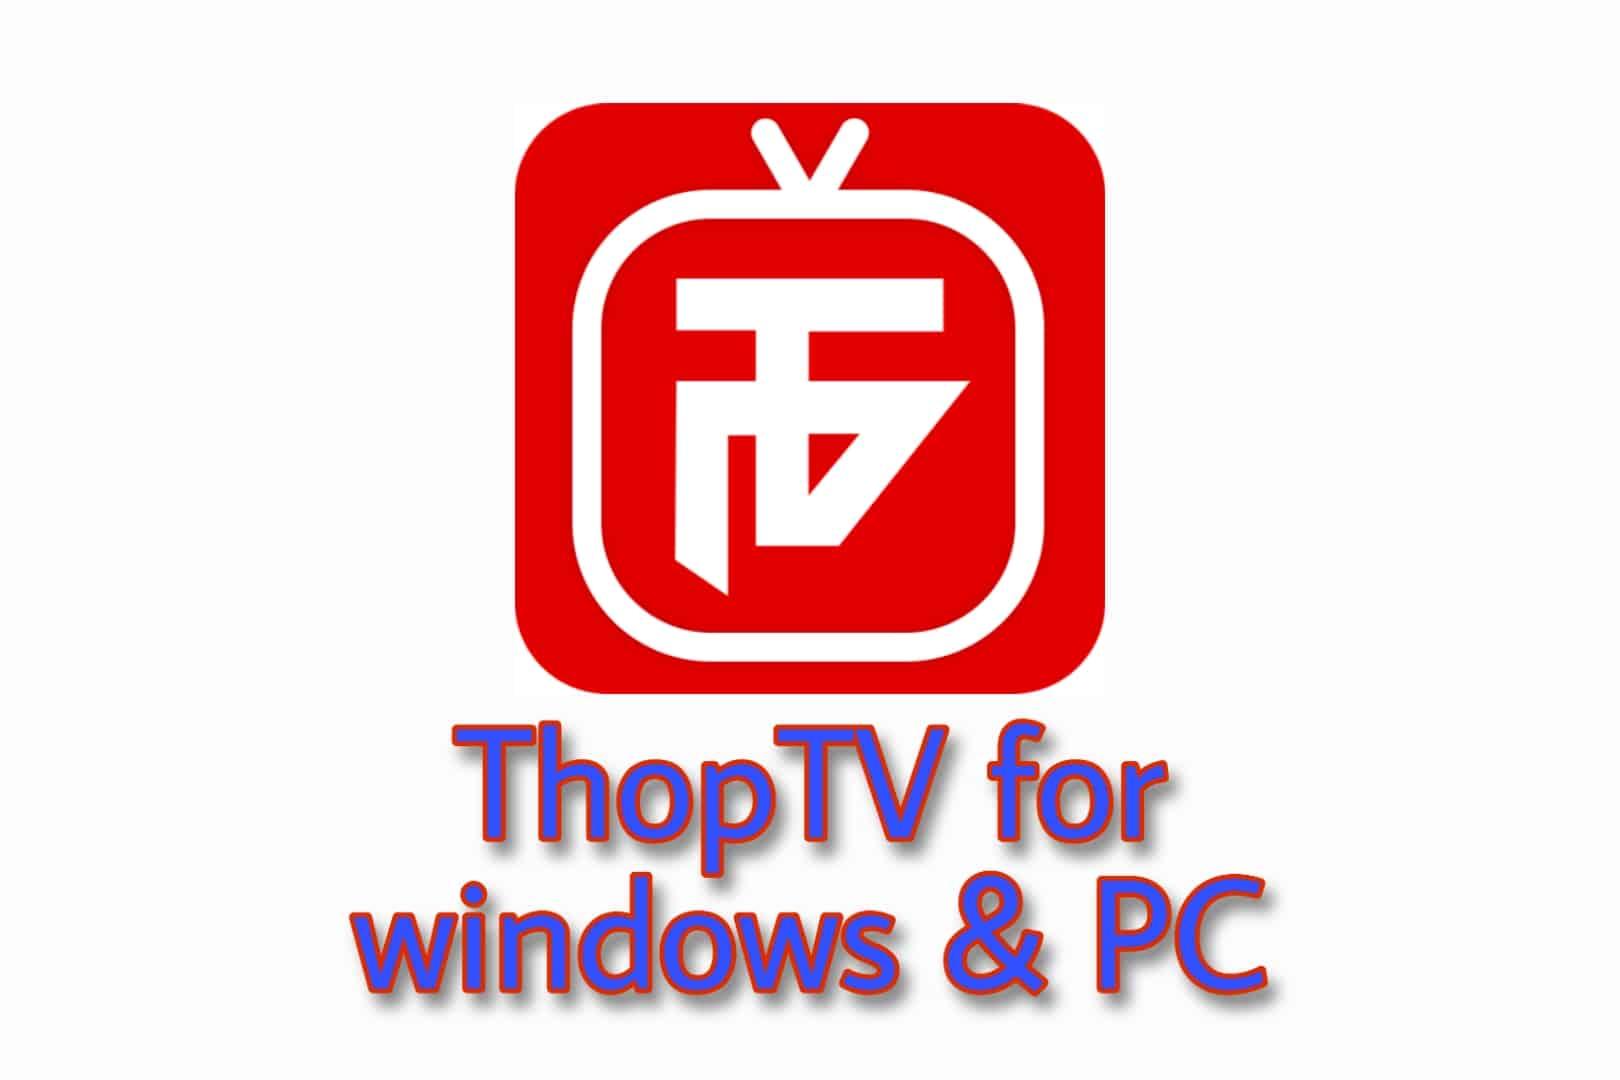 ThopTV for windows & PC v.44.0 | Latest Jan 2021